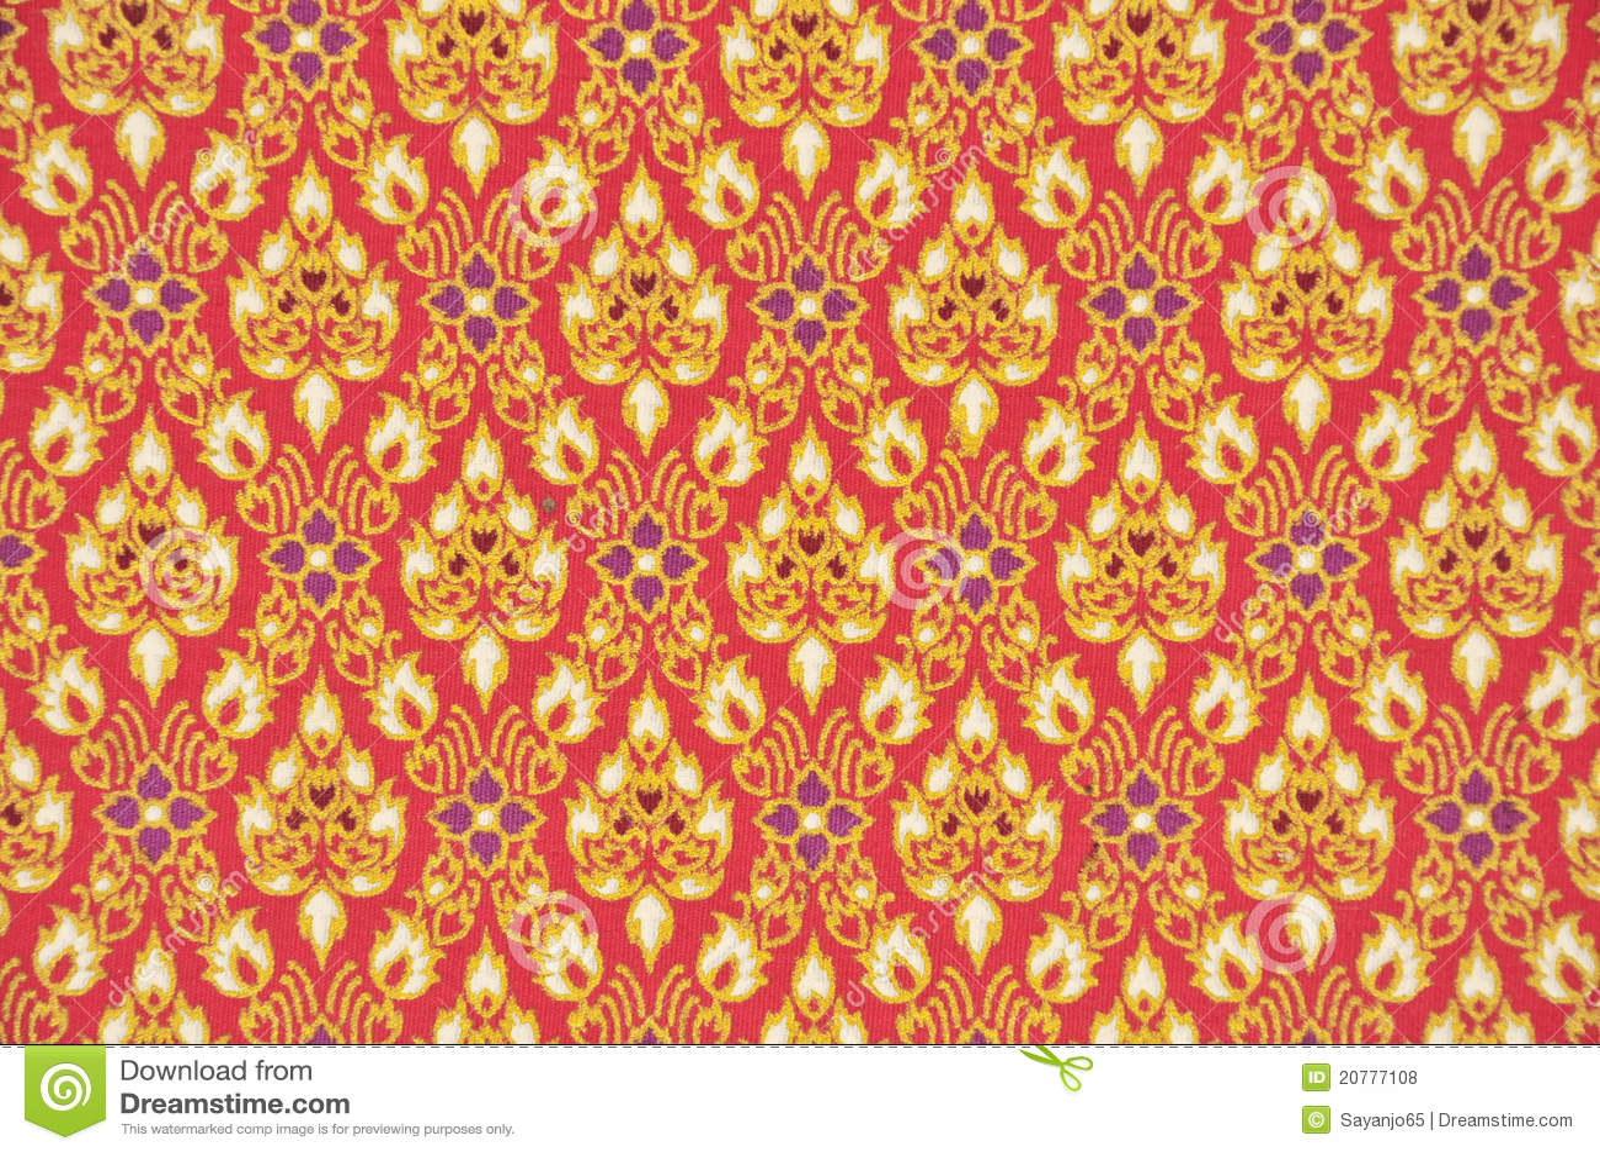 Images artistic texture, Thai texture, Lay Thai st